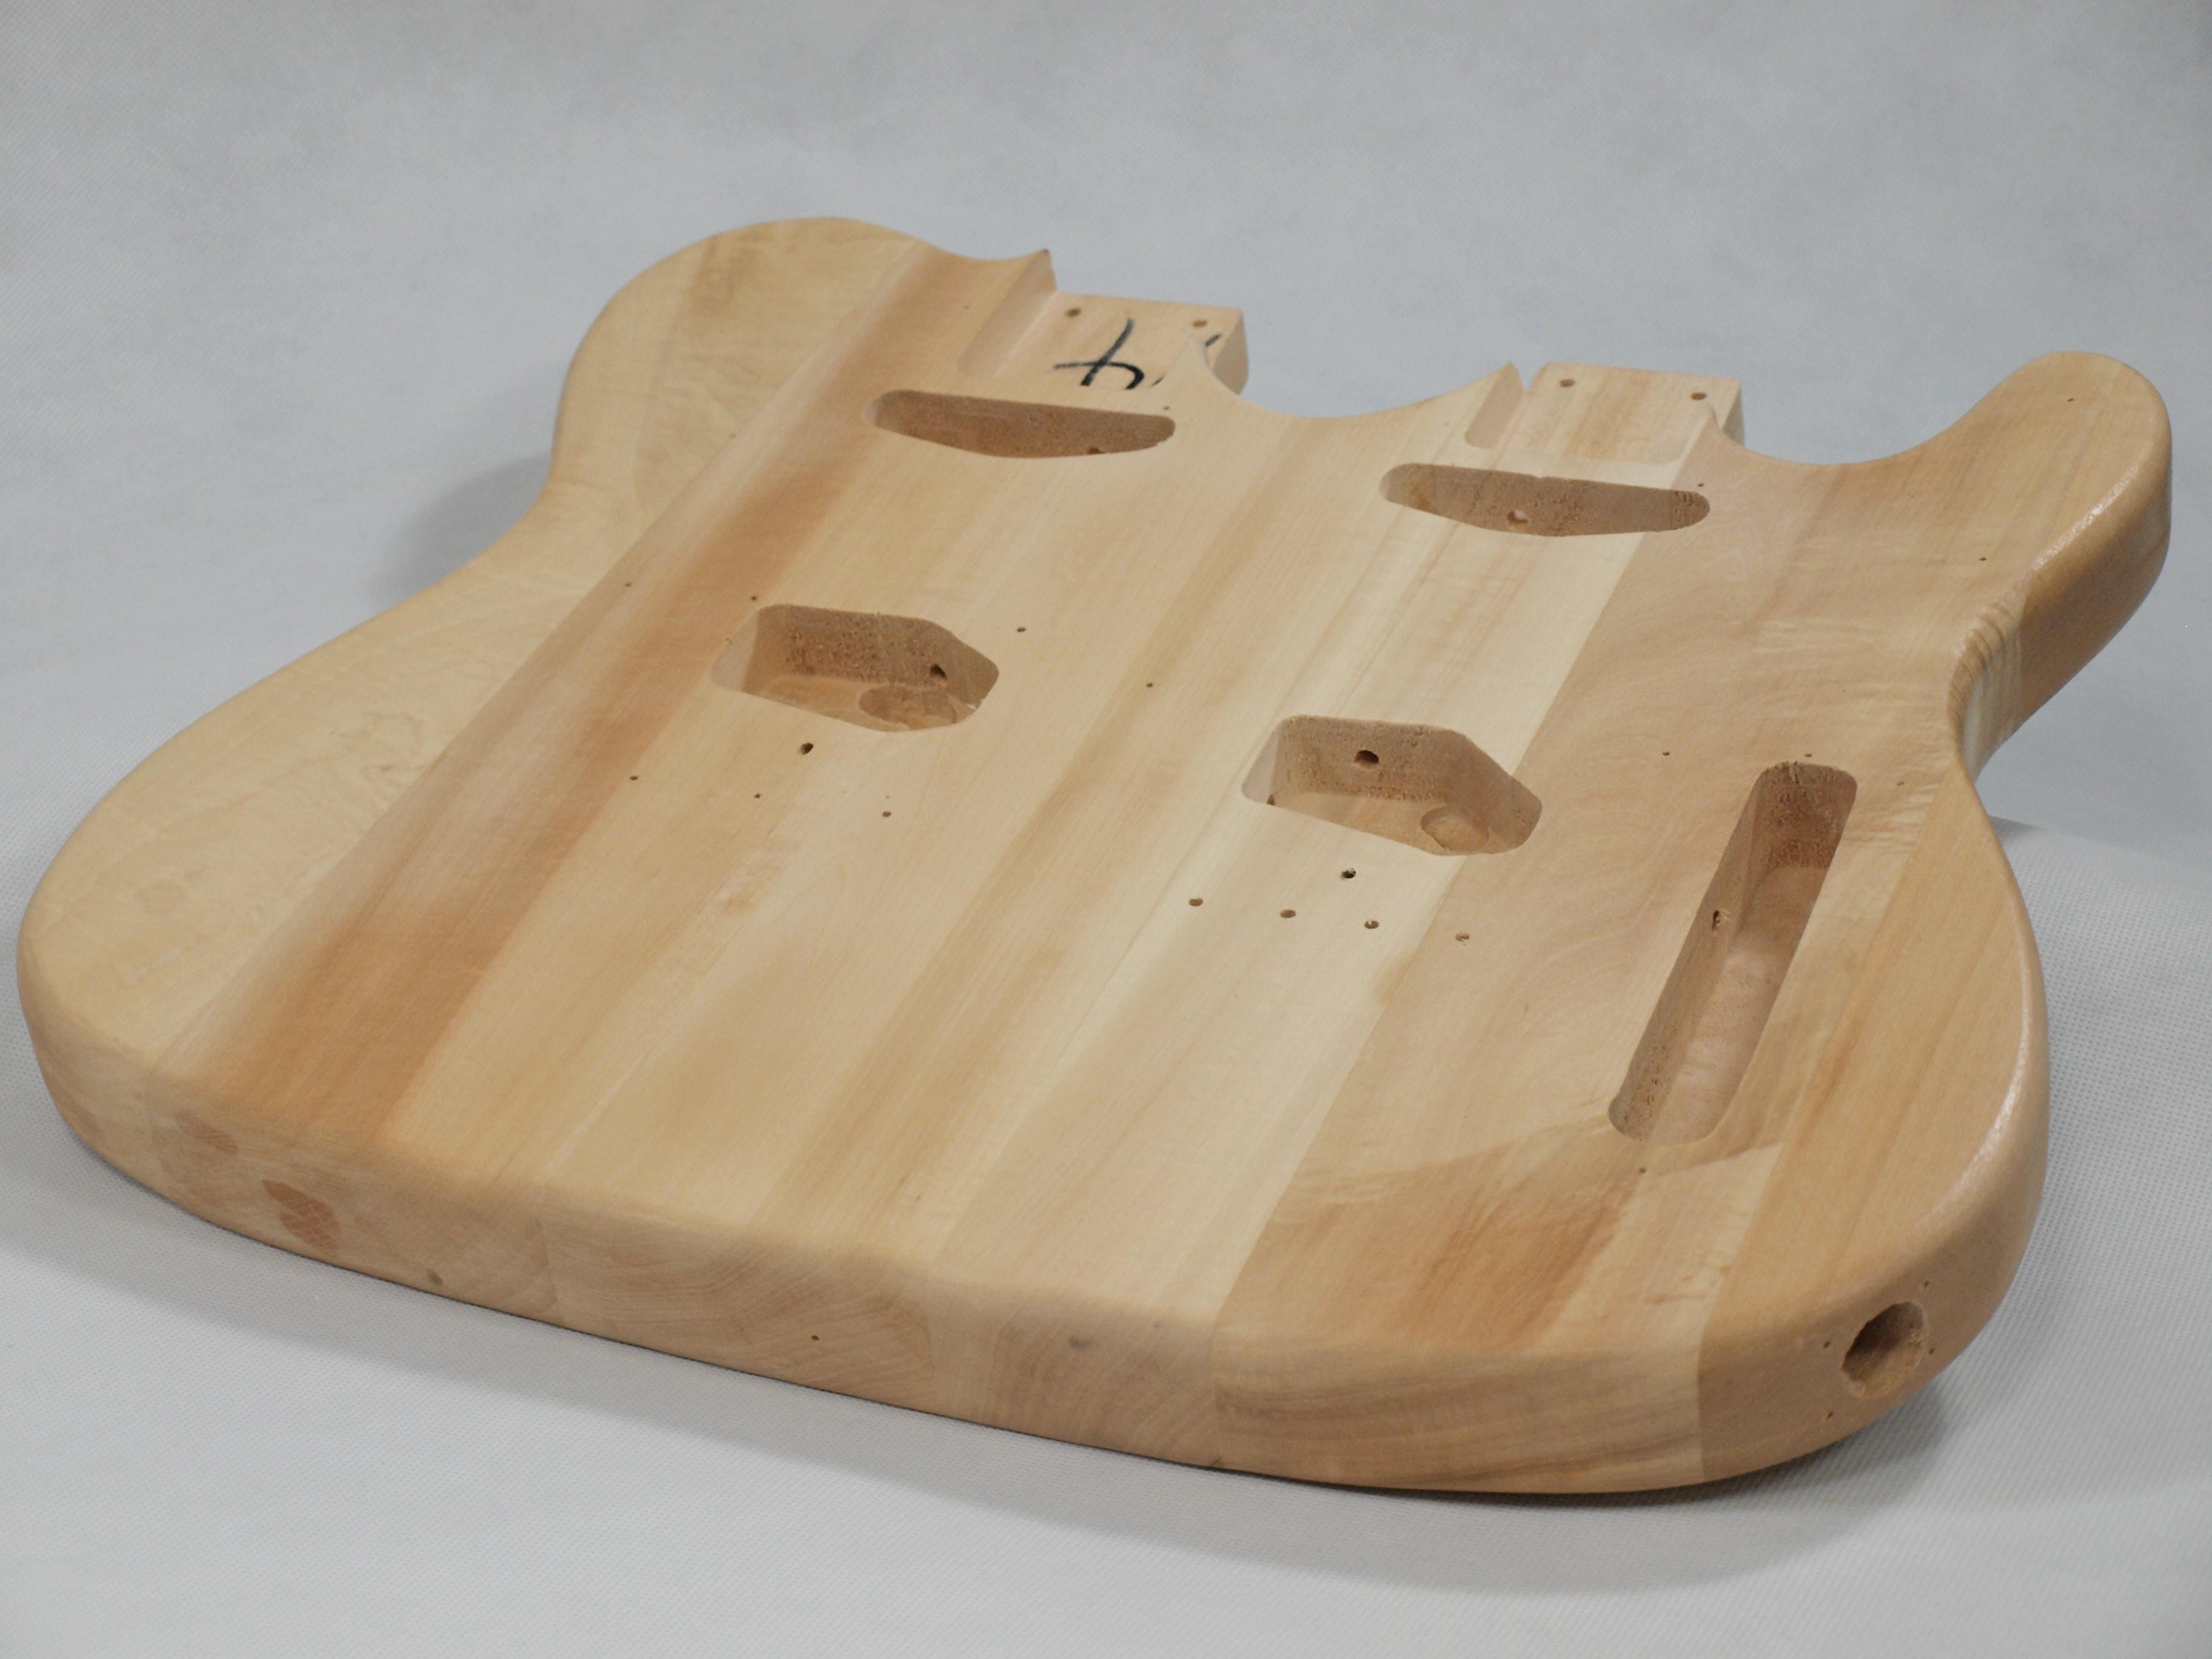 solo tc style diy guitar kit double neck basswood body maple fb rh solomusicgear com Double Bass Diagram Double Humbucker Wiring-Diagram